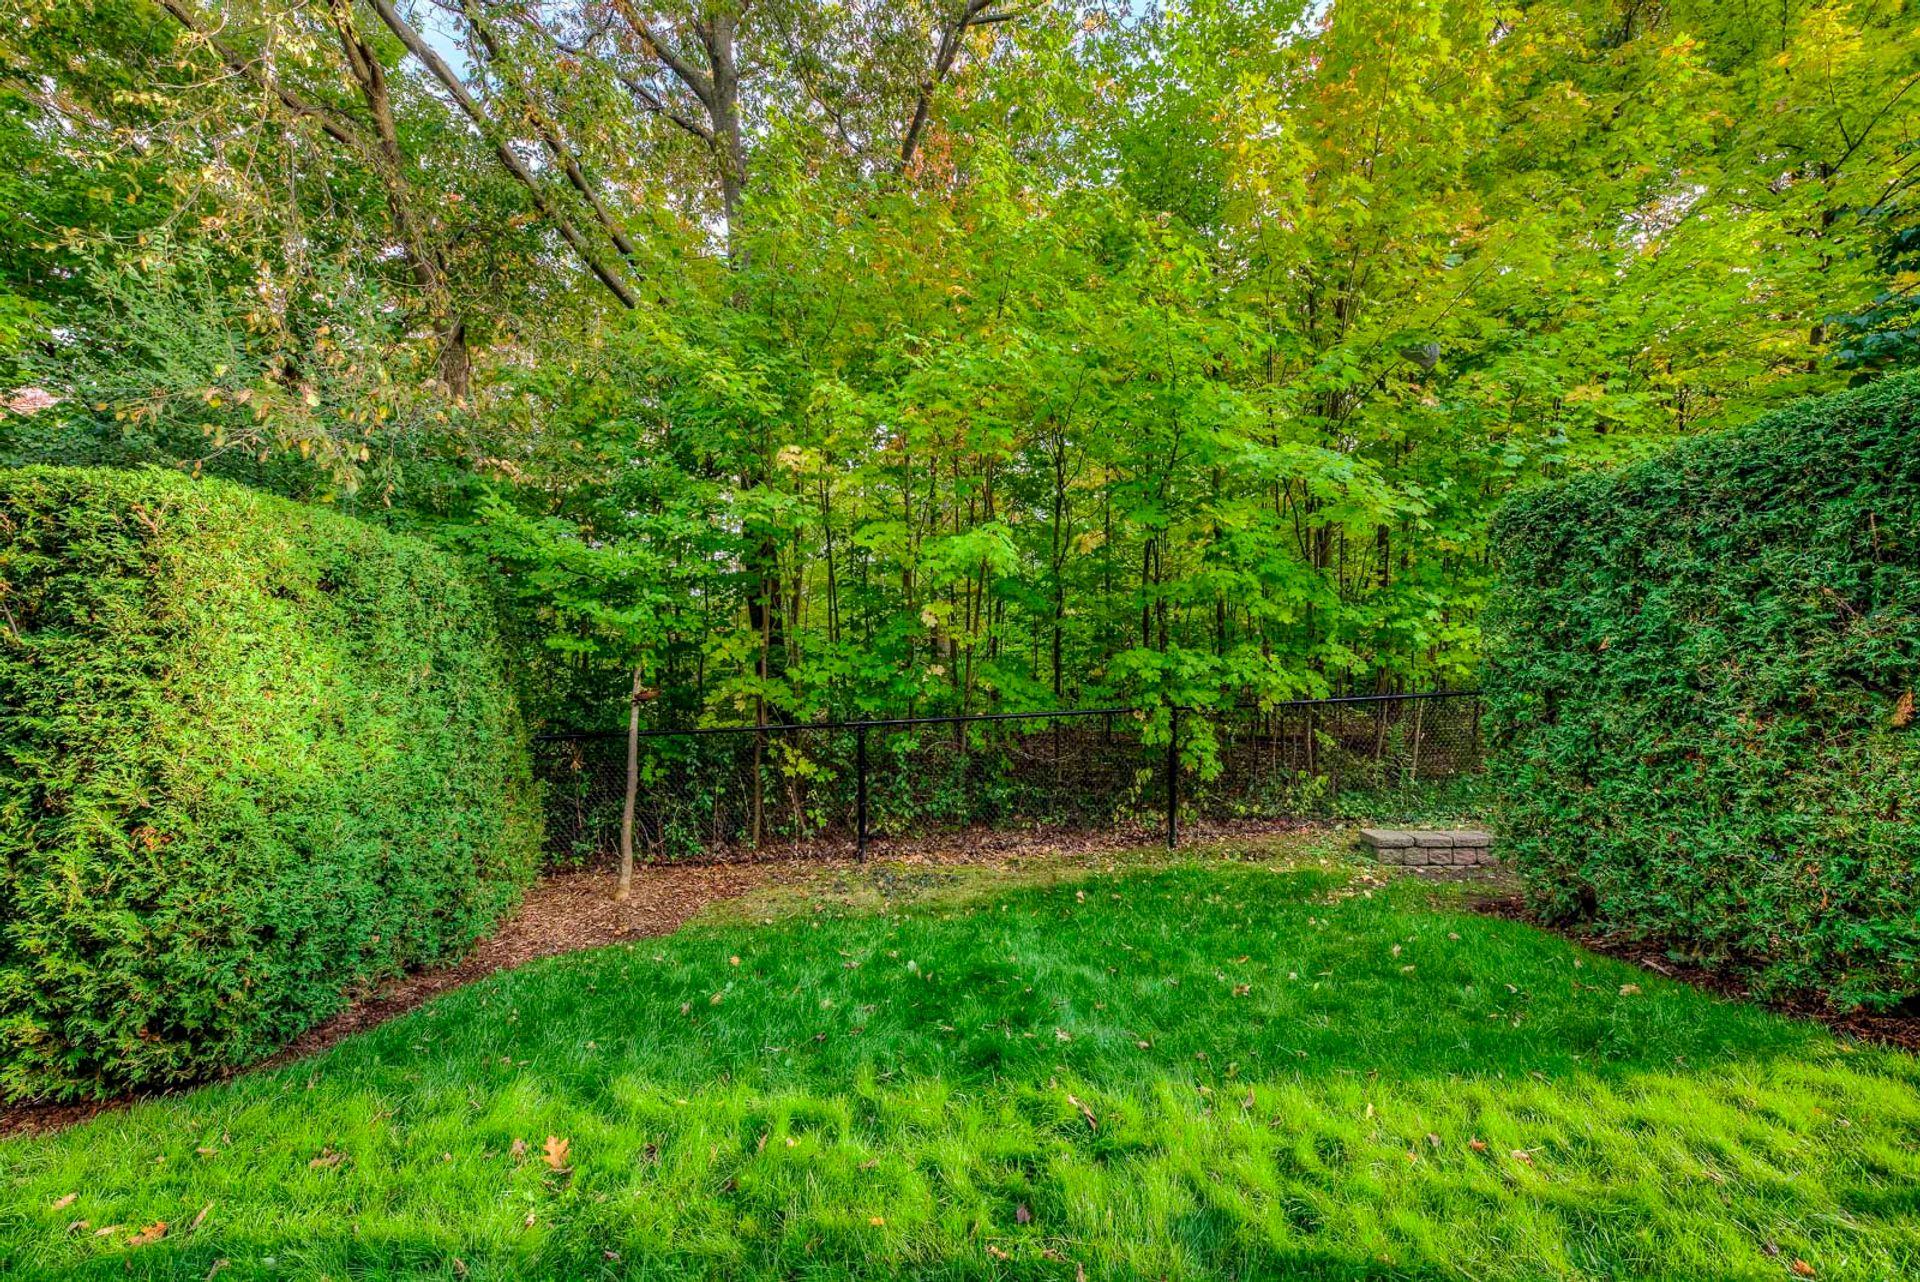 Backyard - 12-2254 Rockingham Dr, Oakville at 12 - 2254 Rockingham Drive, Iroquois Ridge North, Oakville